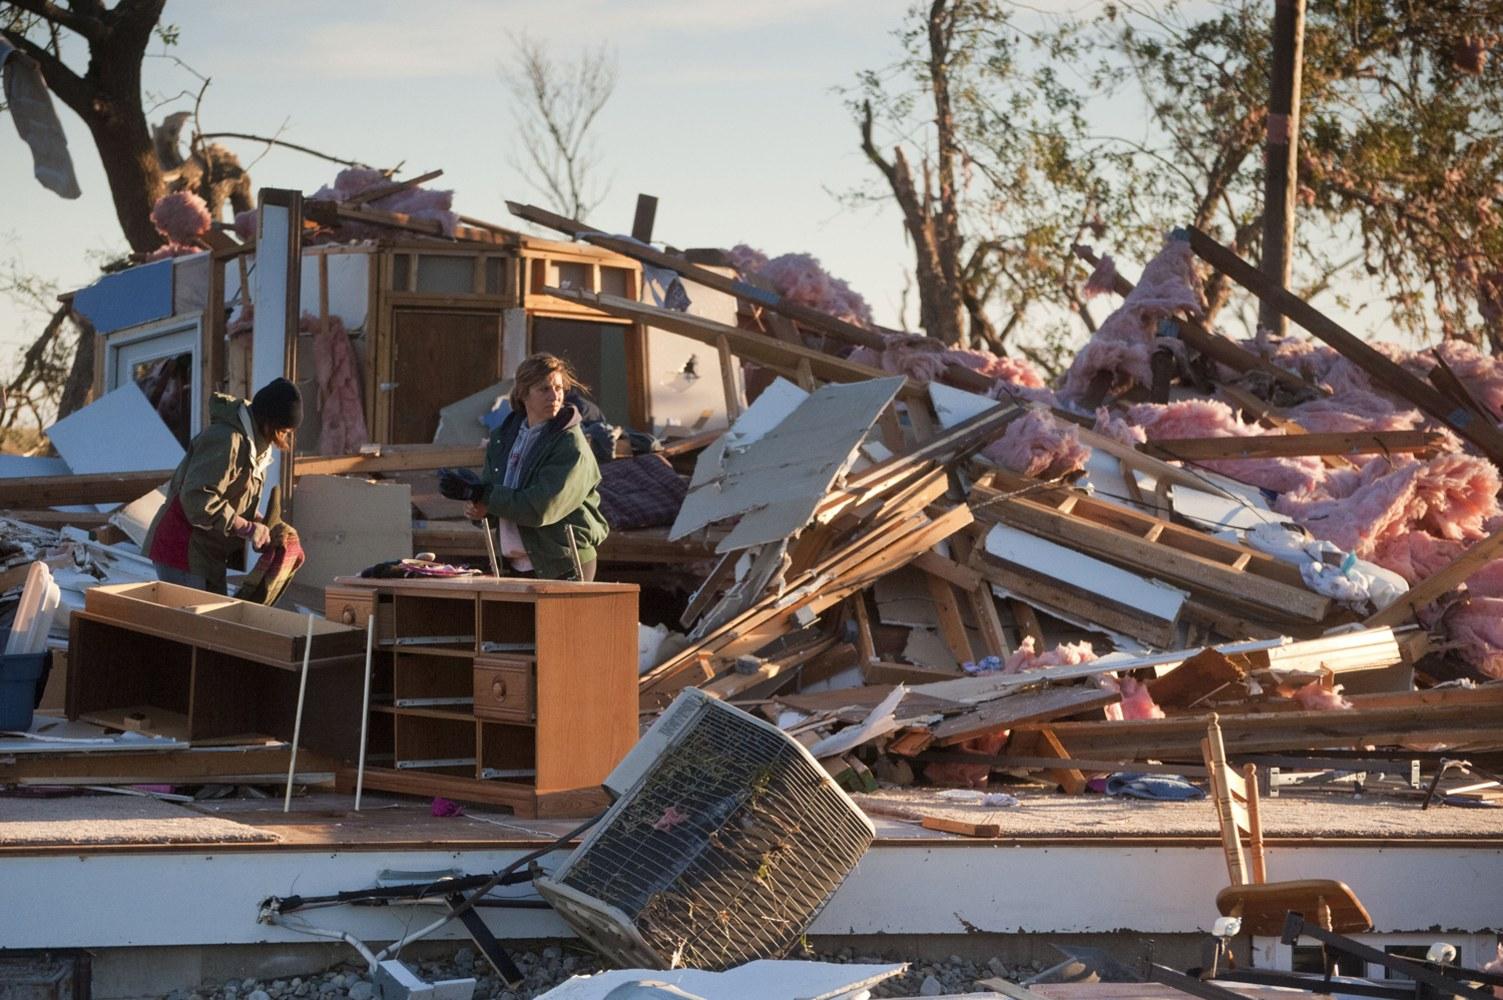 Arnies Wayne Ne >> Tornadoes cause damage, injuries across Iowa, Nebraska ...